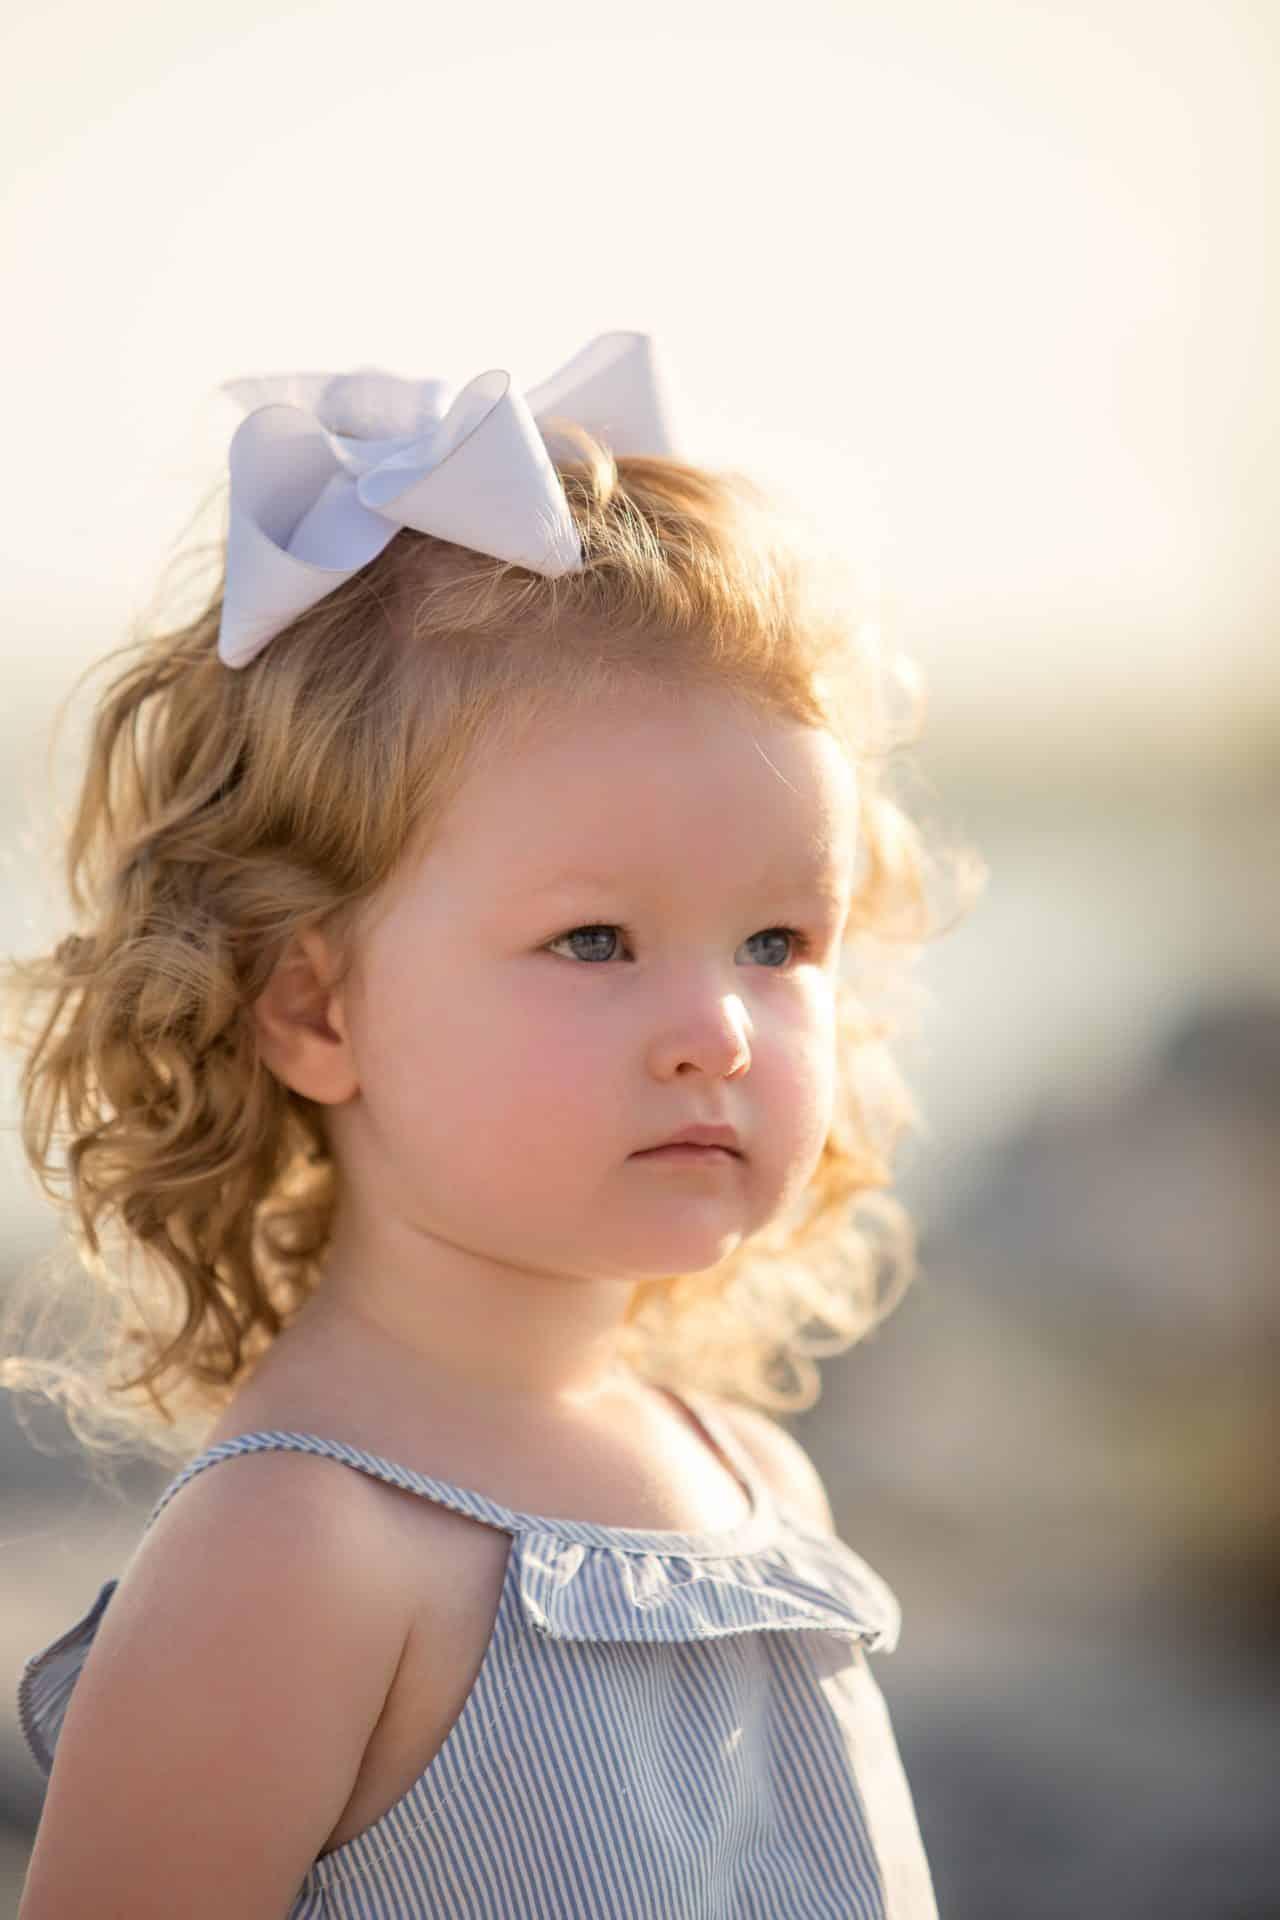 beach photos at lighthouse point park, ponce inlet portraiture, family portrait services, professional family portrait